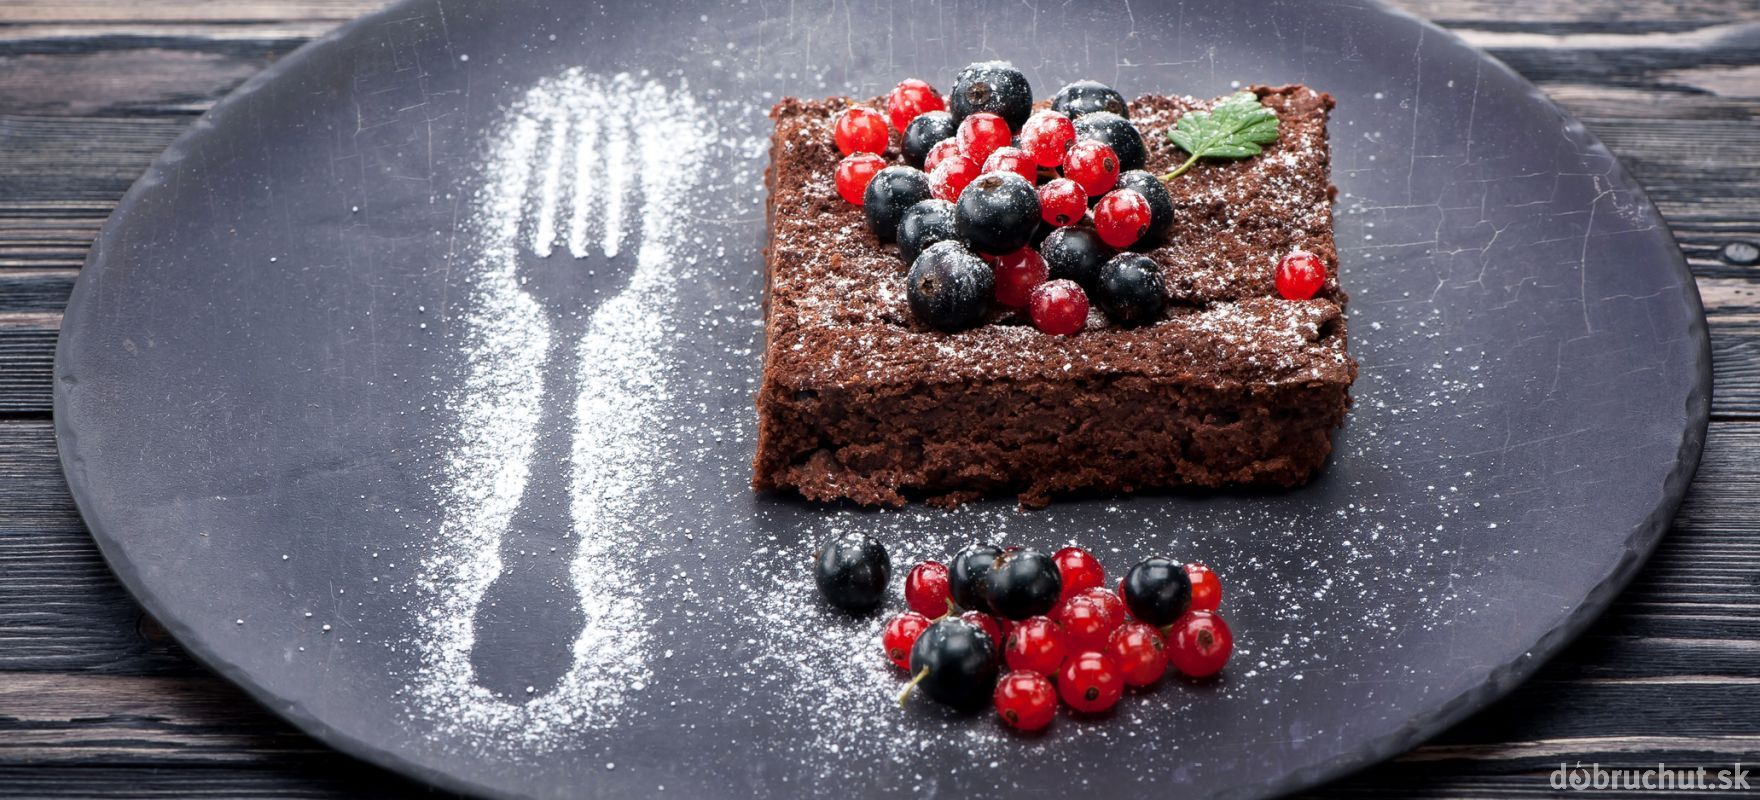 Jablkovo-orieškový koláč bez múky